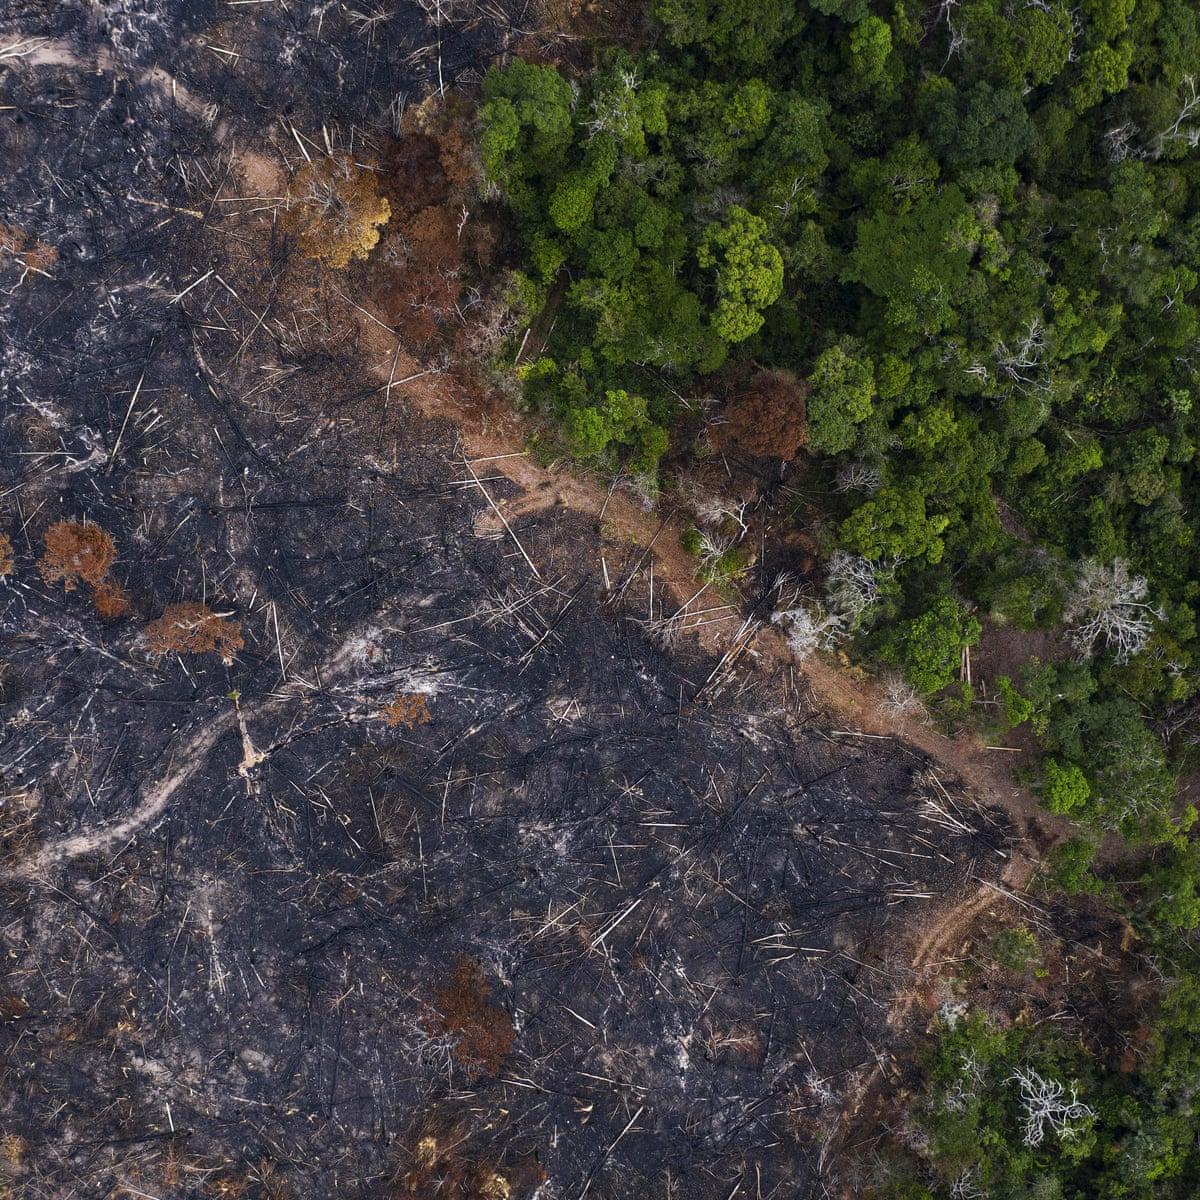 Brazil Using Coronavirus To Cover Up Assaults On Amazon Warn Activists World News The Guardian